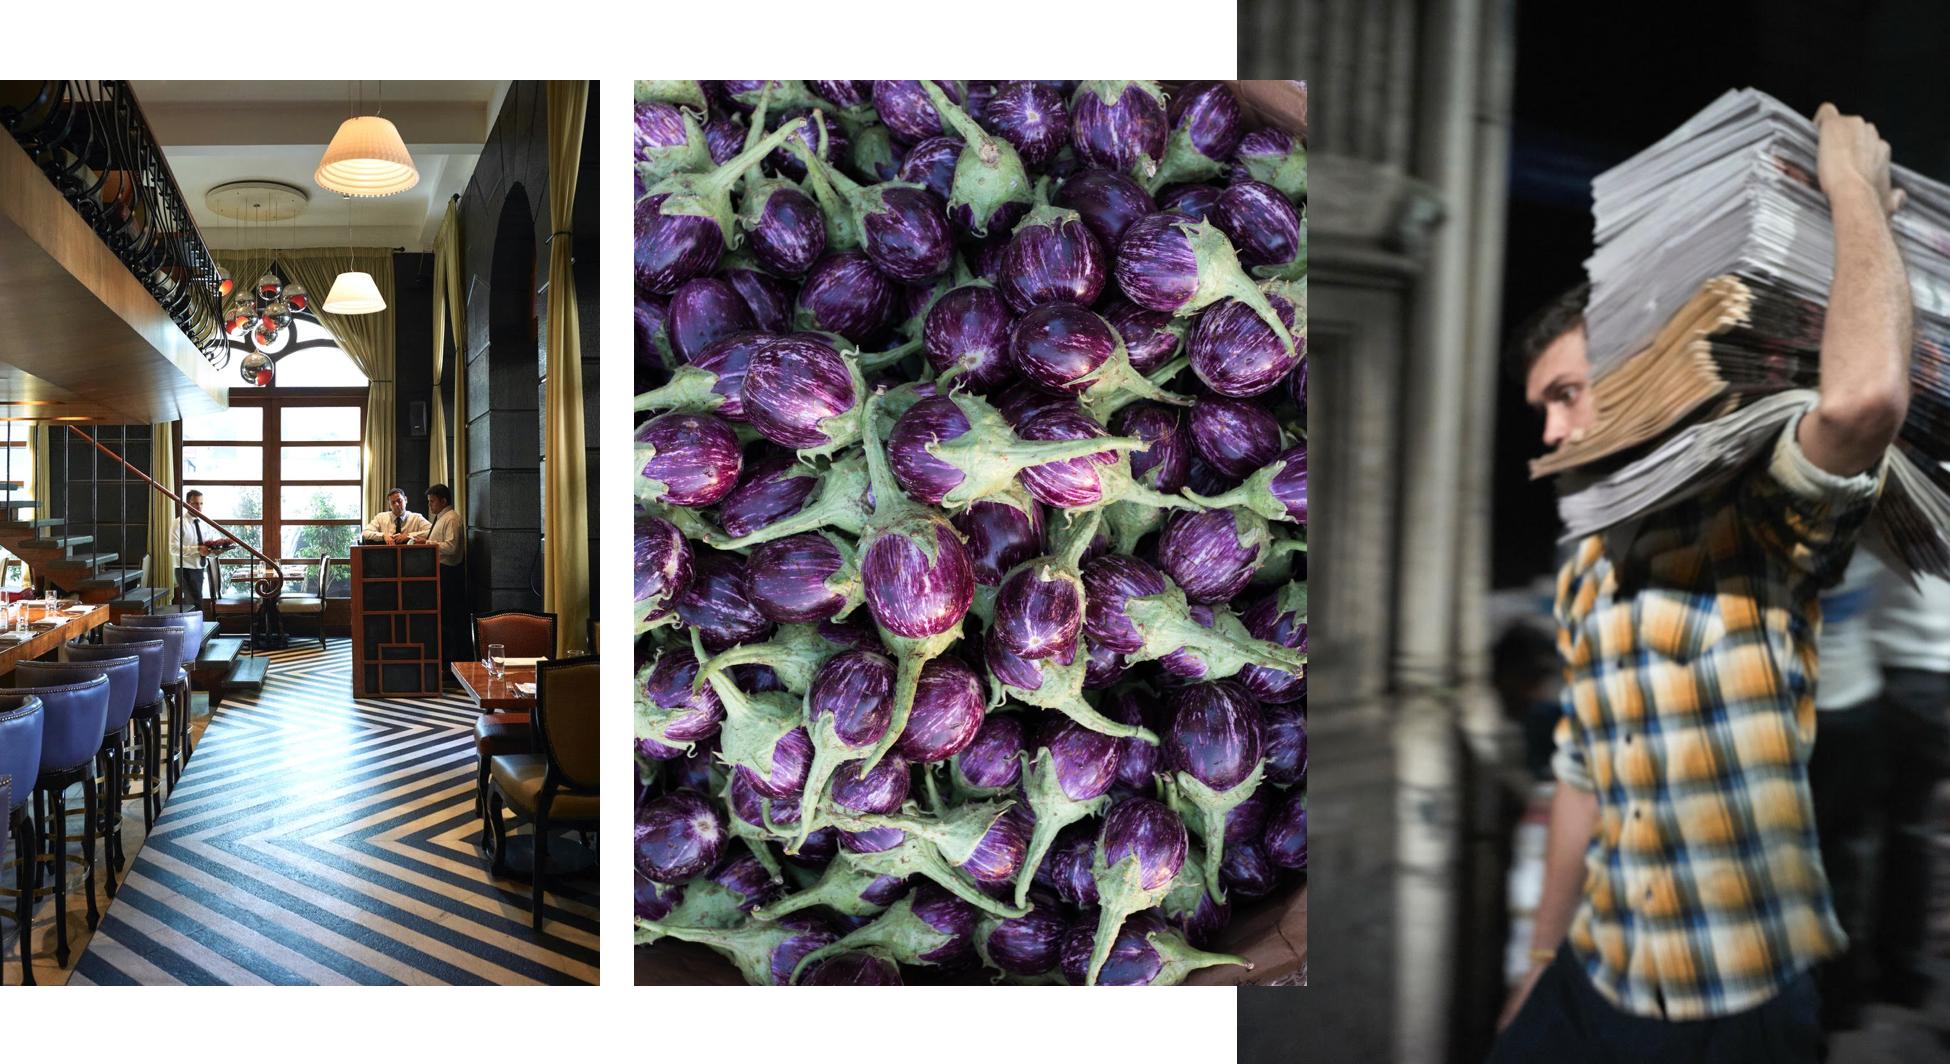 Photos: The Table, Vegetable Market + Newspaper Sorting by Björn Wallander